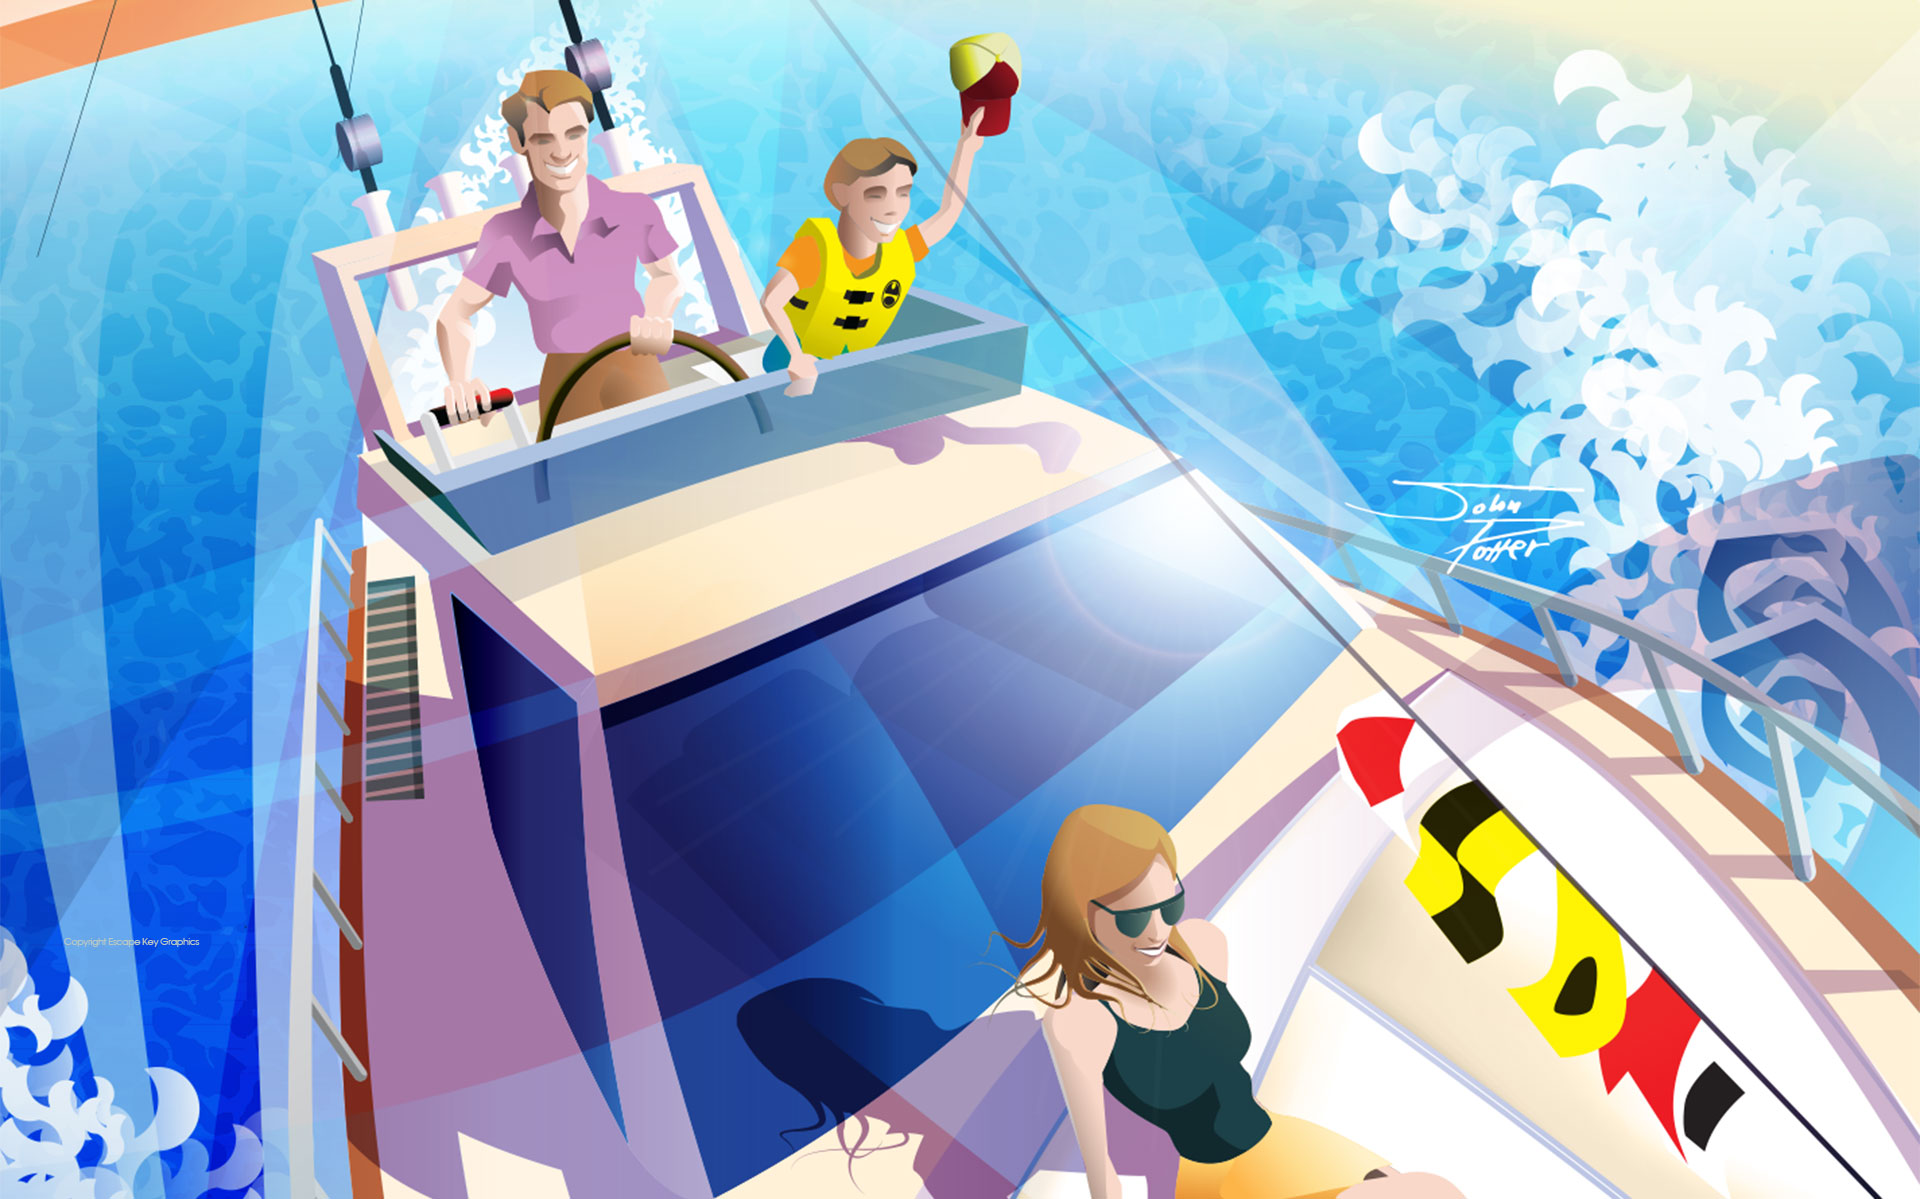 Boat Show Illustration for FLIBS 2014